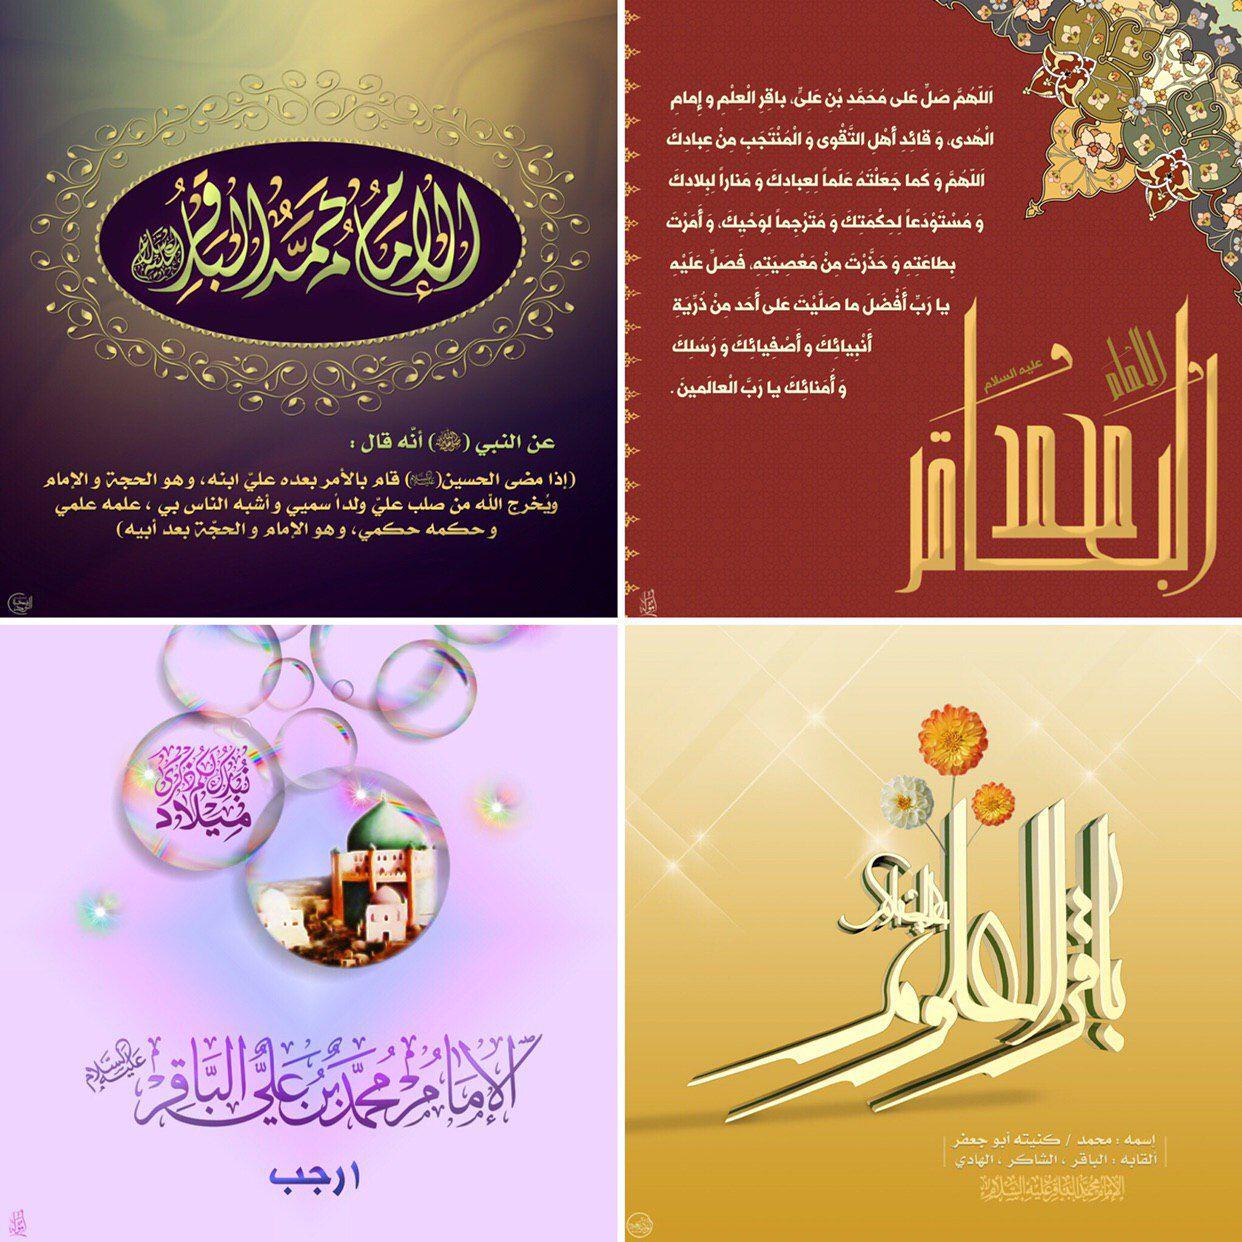 Pin By Ali علي On أهل البيت عليهم السلام Movie Posters Poster Art